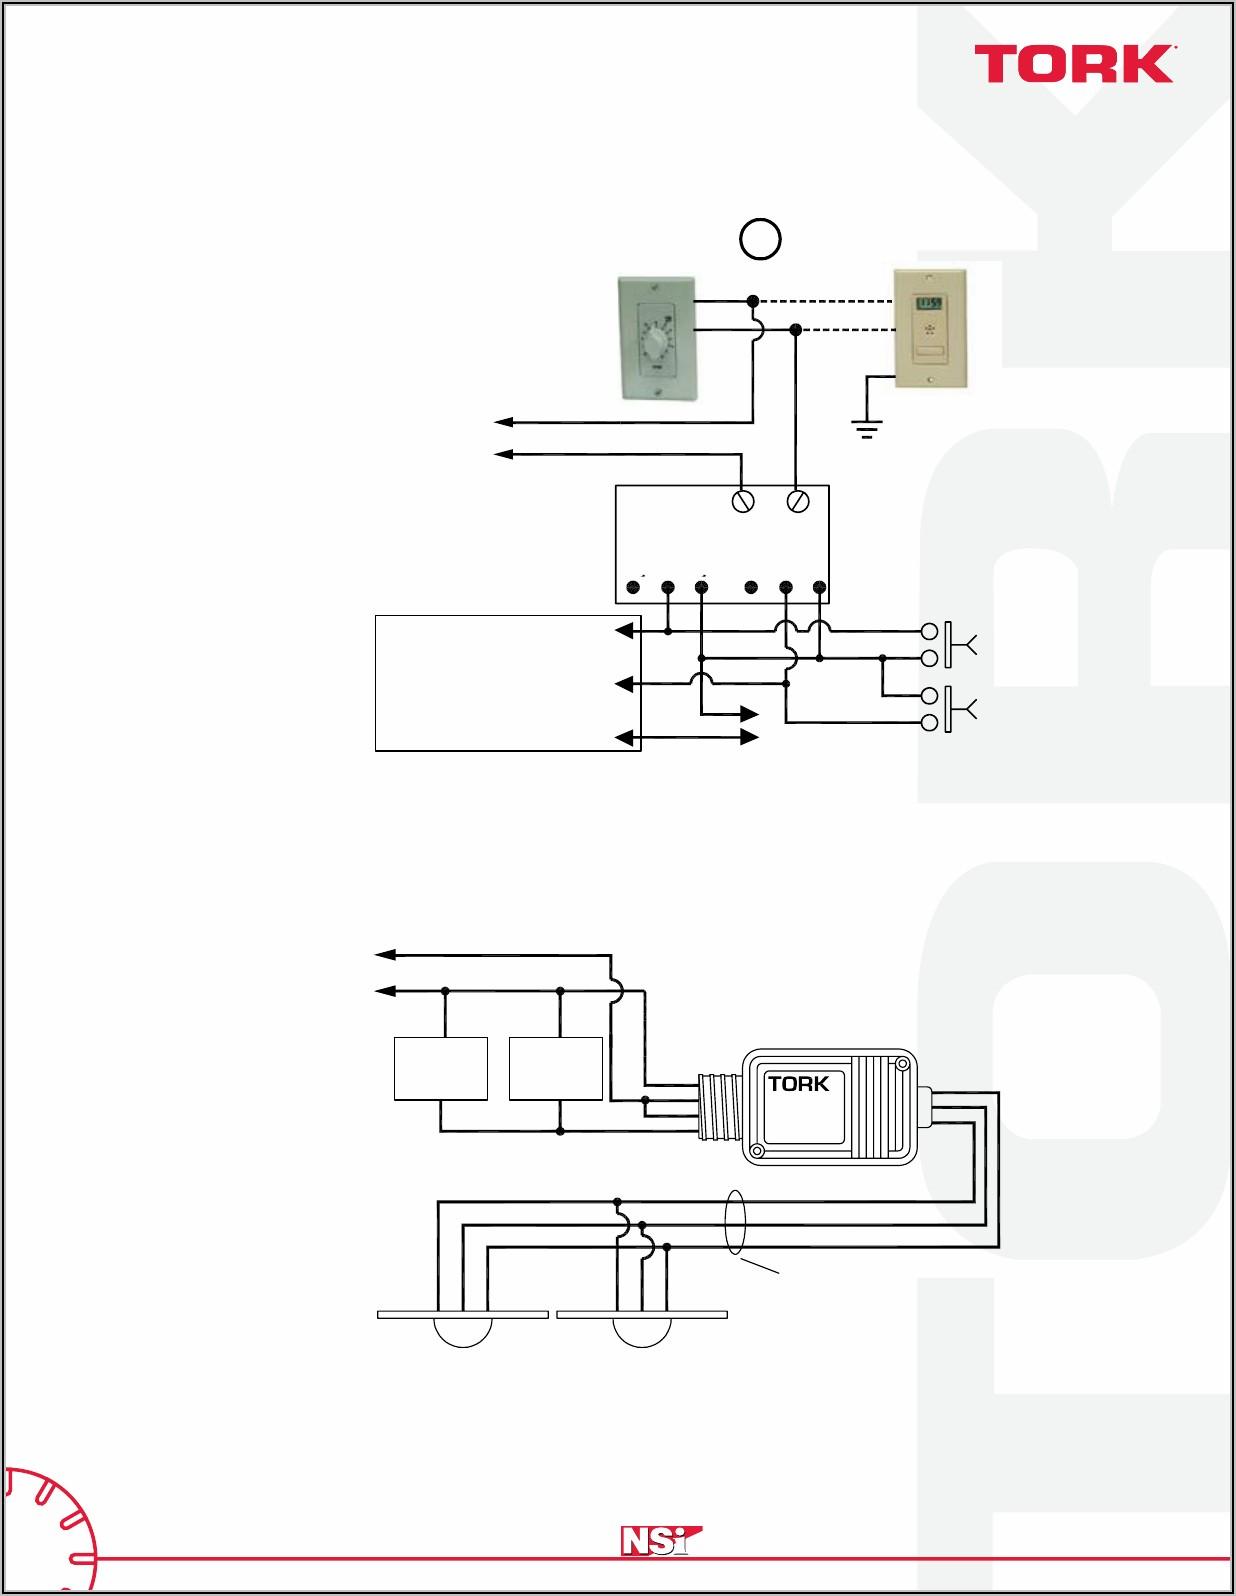 Tork Photocell 2101 Wiring Diagram